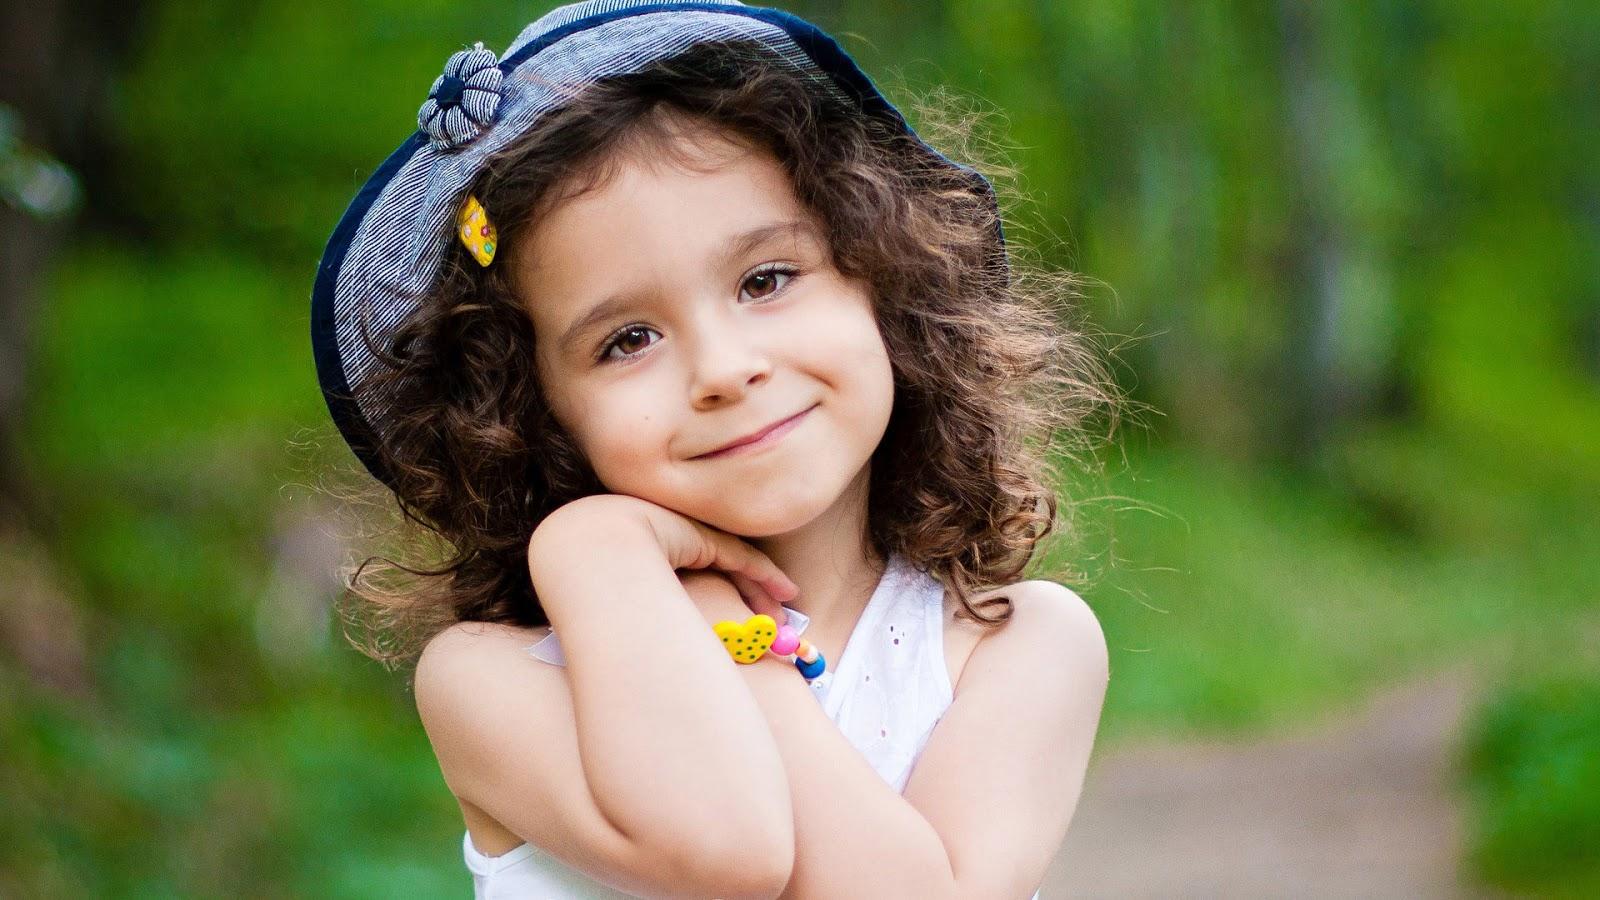 Cute Cry Baby Wallpaper Very Cute Little Girl Hd Wallpaper Cute Little Babies